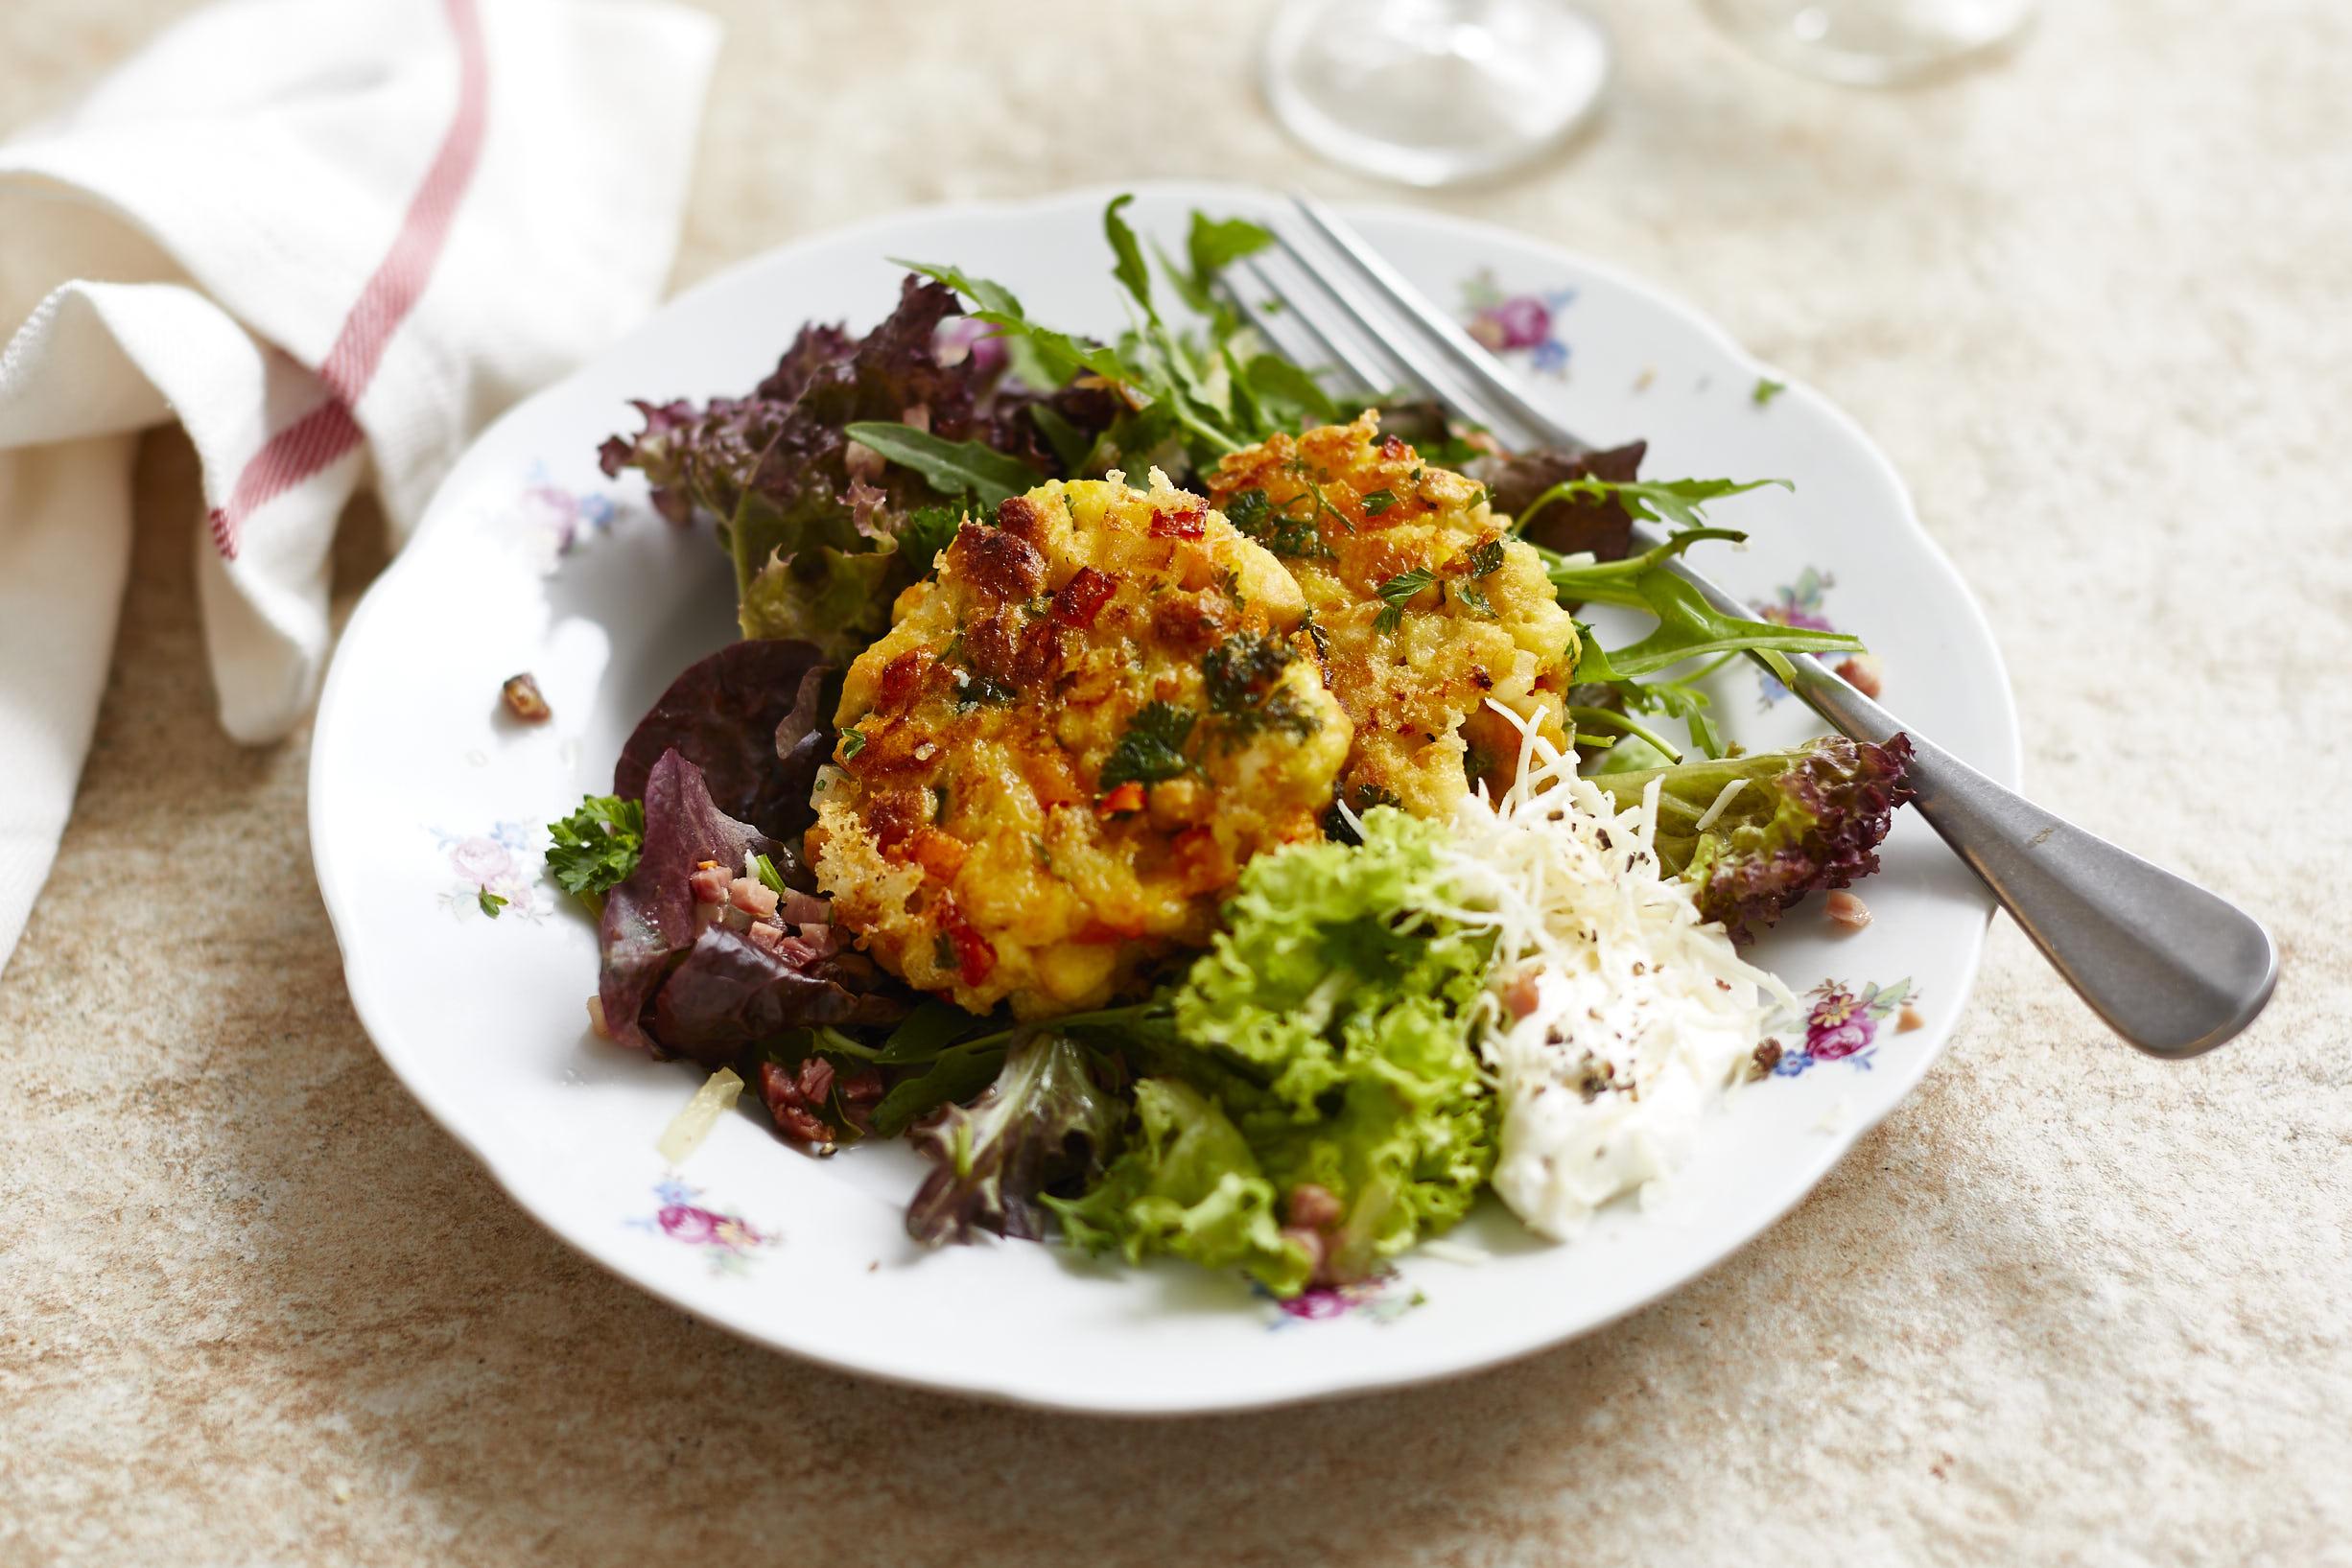 Kürbis-Kaspressknödeln mit Salat, Speckvinaigrette und Krenrahm